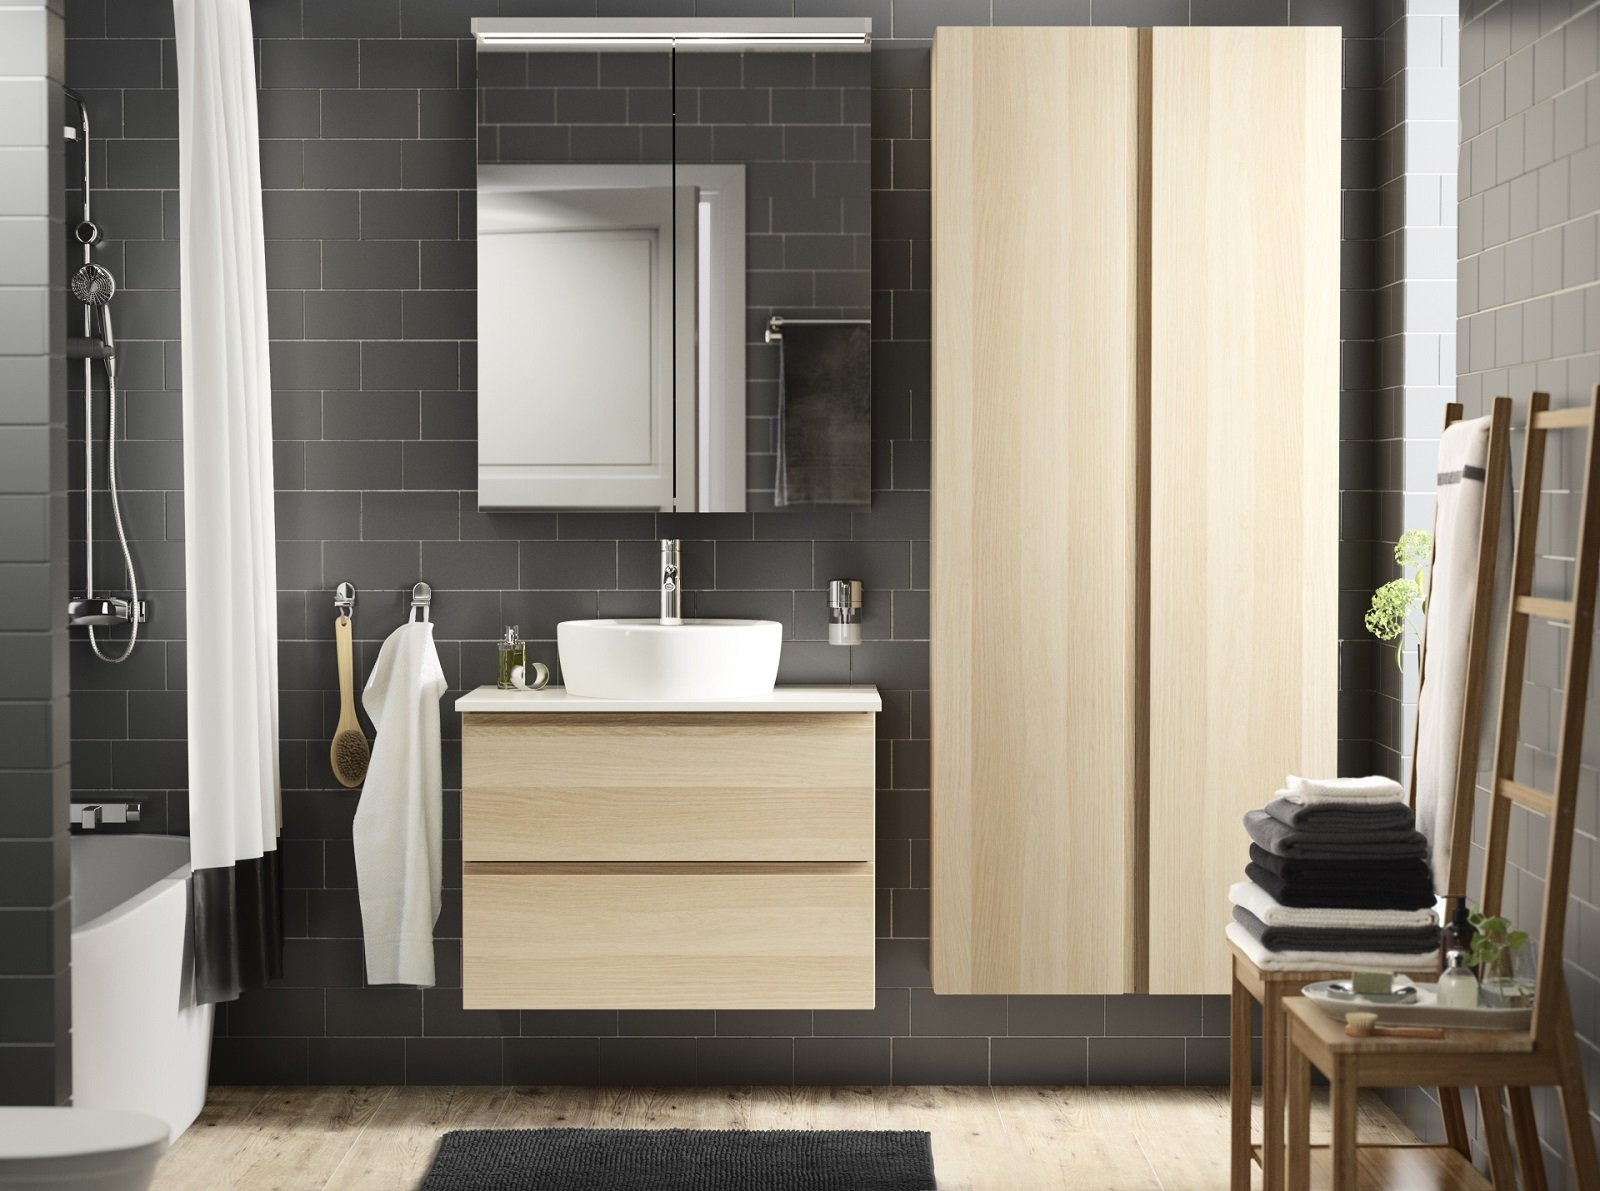 Stunning Ikea Mobili Per Cucina Gallery - bakeroffroad.us ...